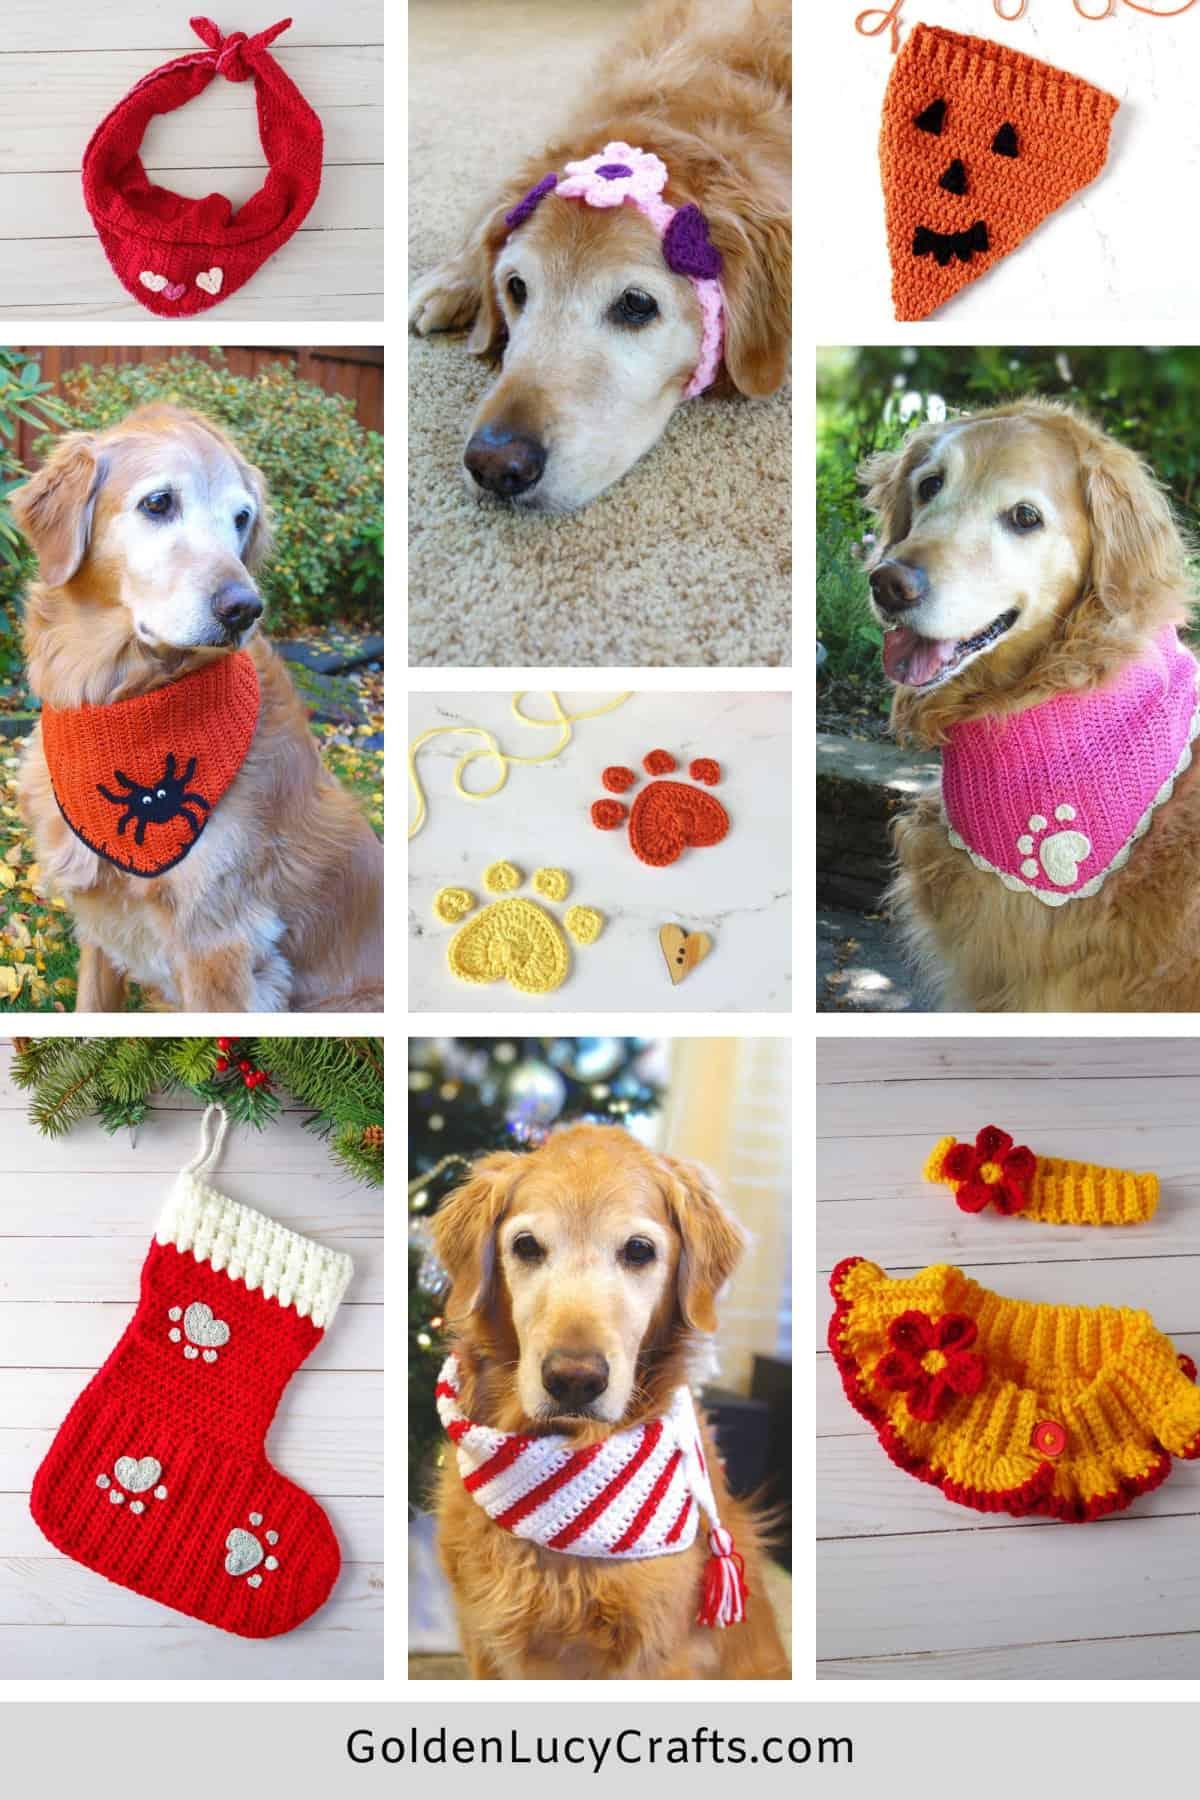 Crochet Patterns For Dogs Design By Goldenlucycrafts